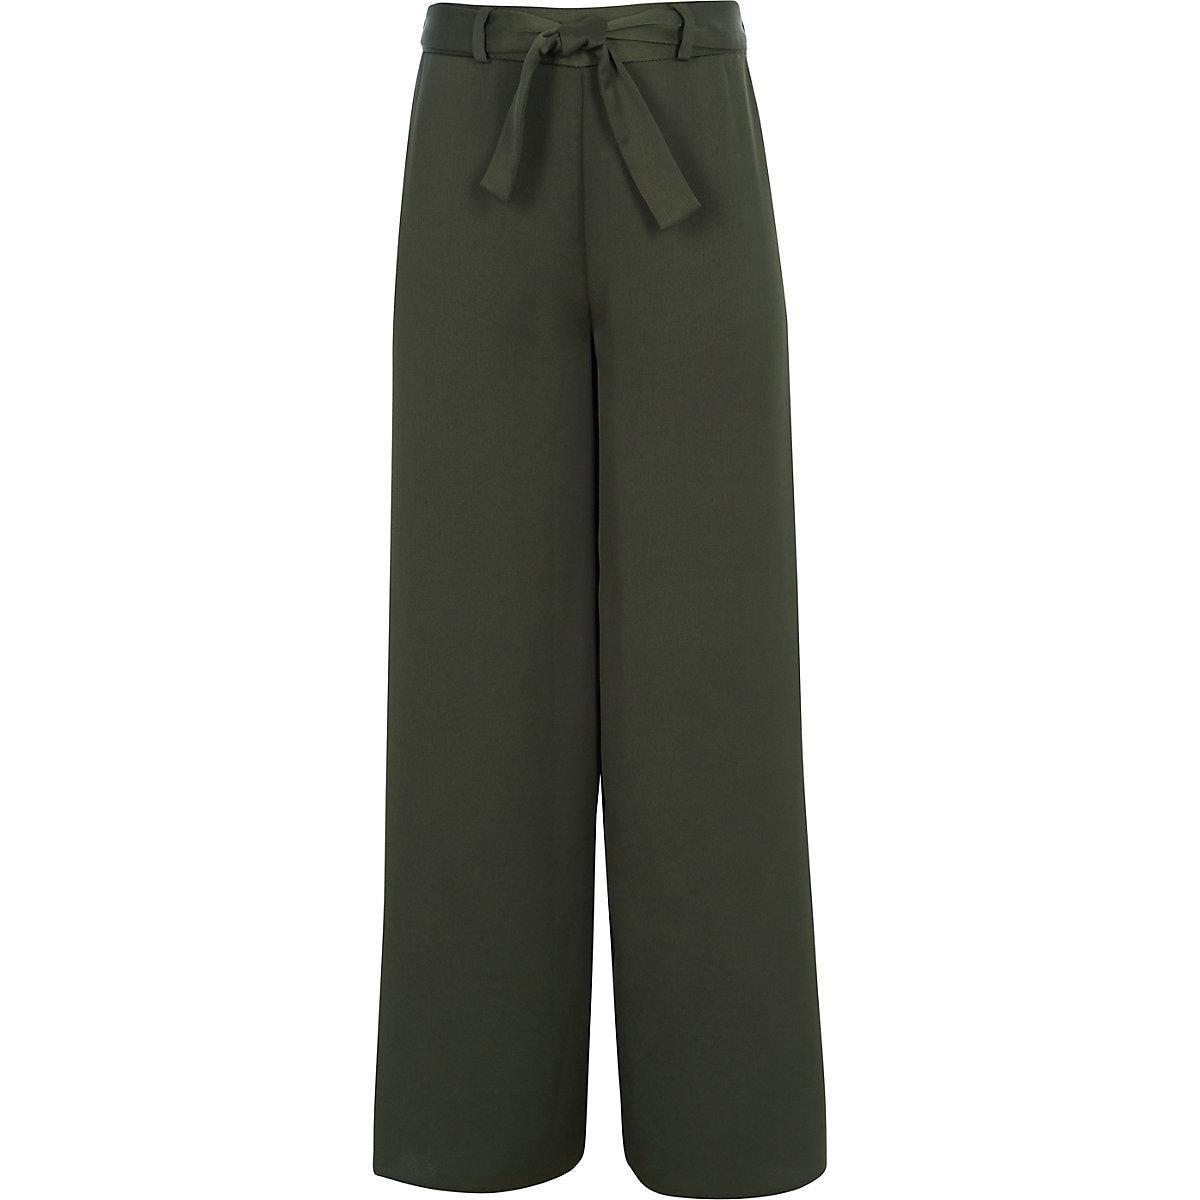 Girls khaki tie waist pants